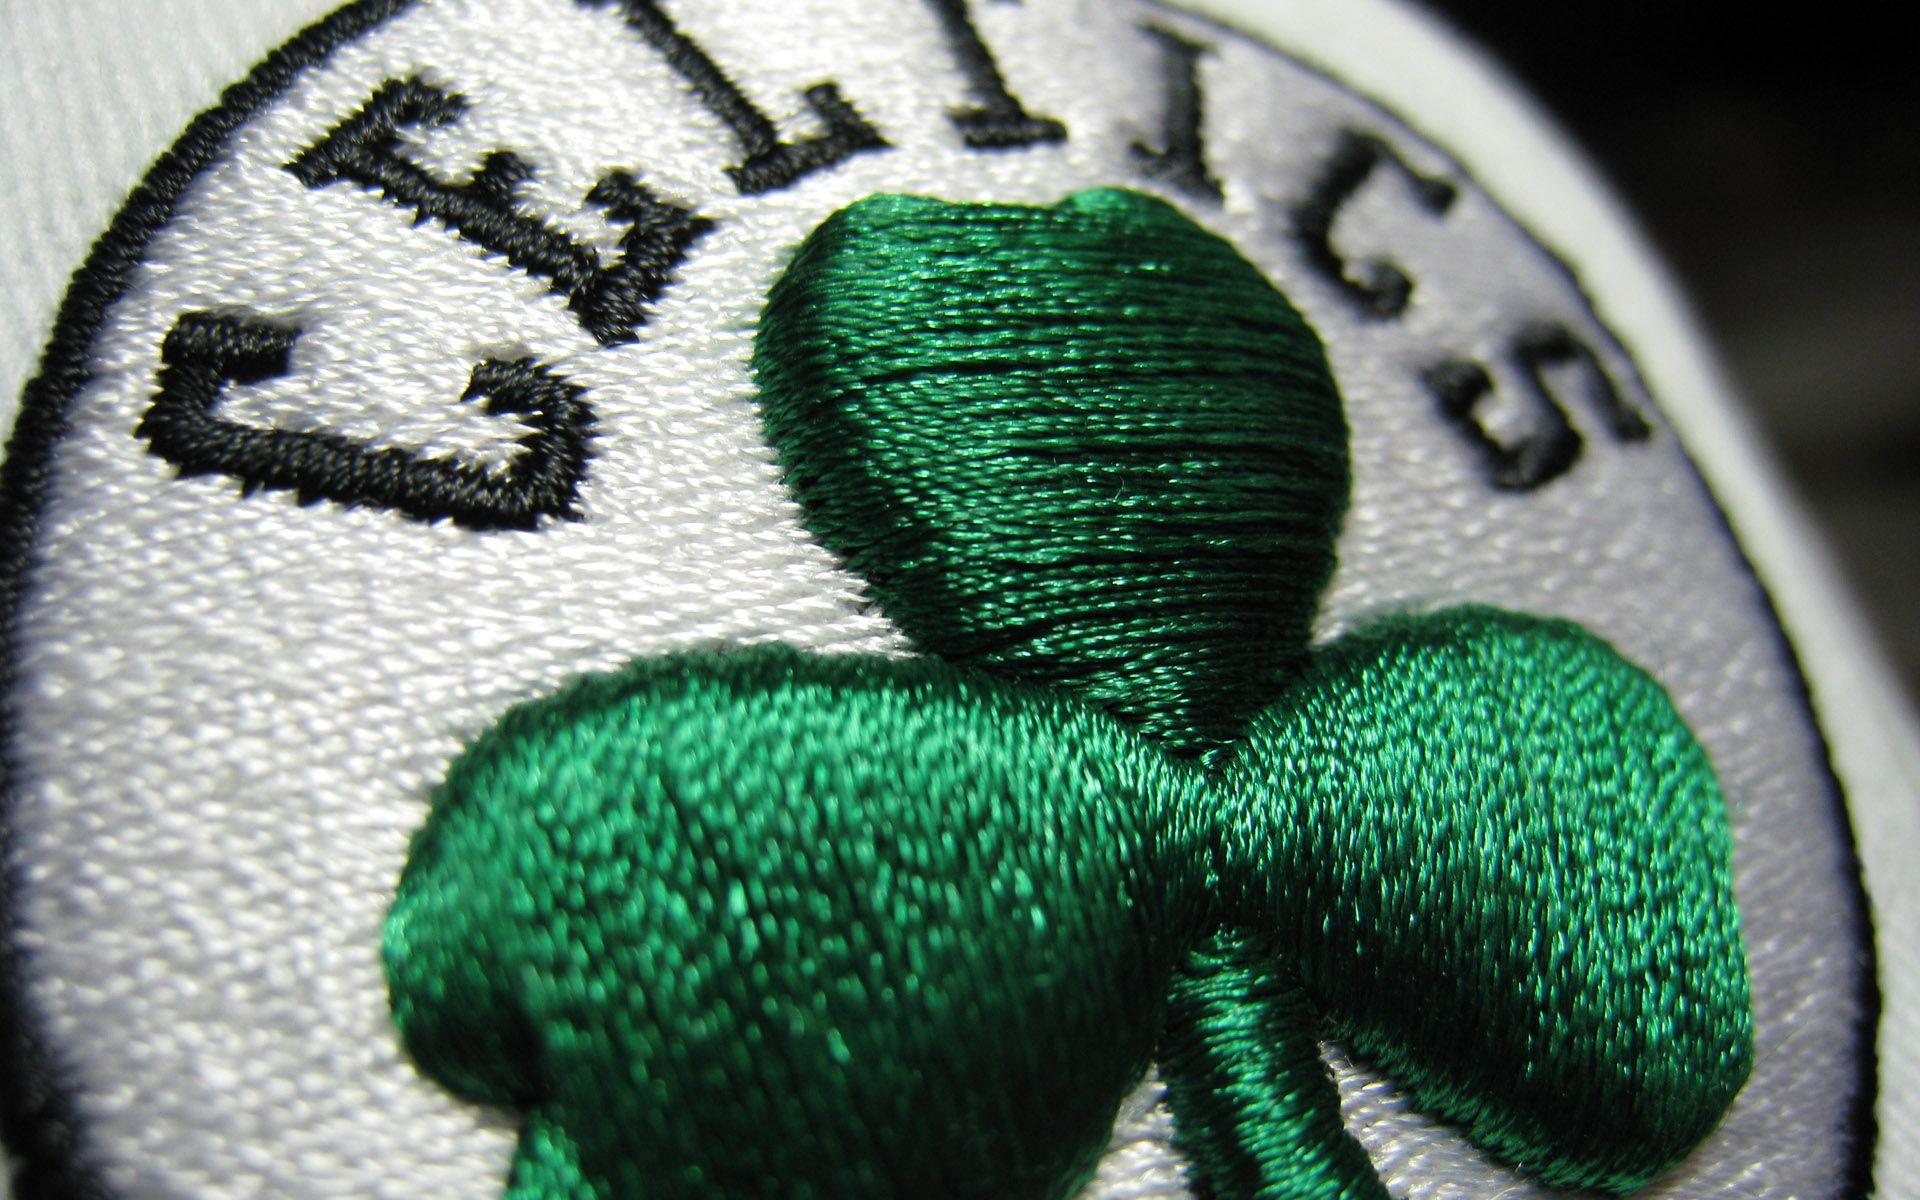 Boston Celtics Sports Celtics De Boston Nfl Y Wallpaper